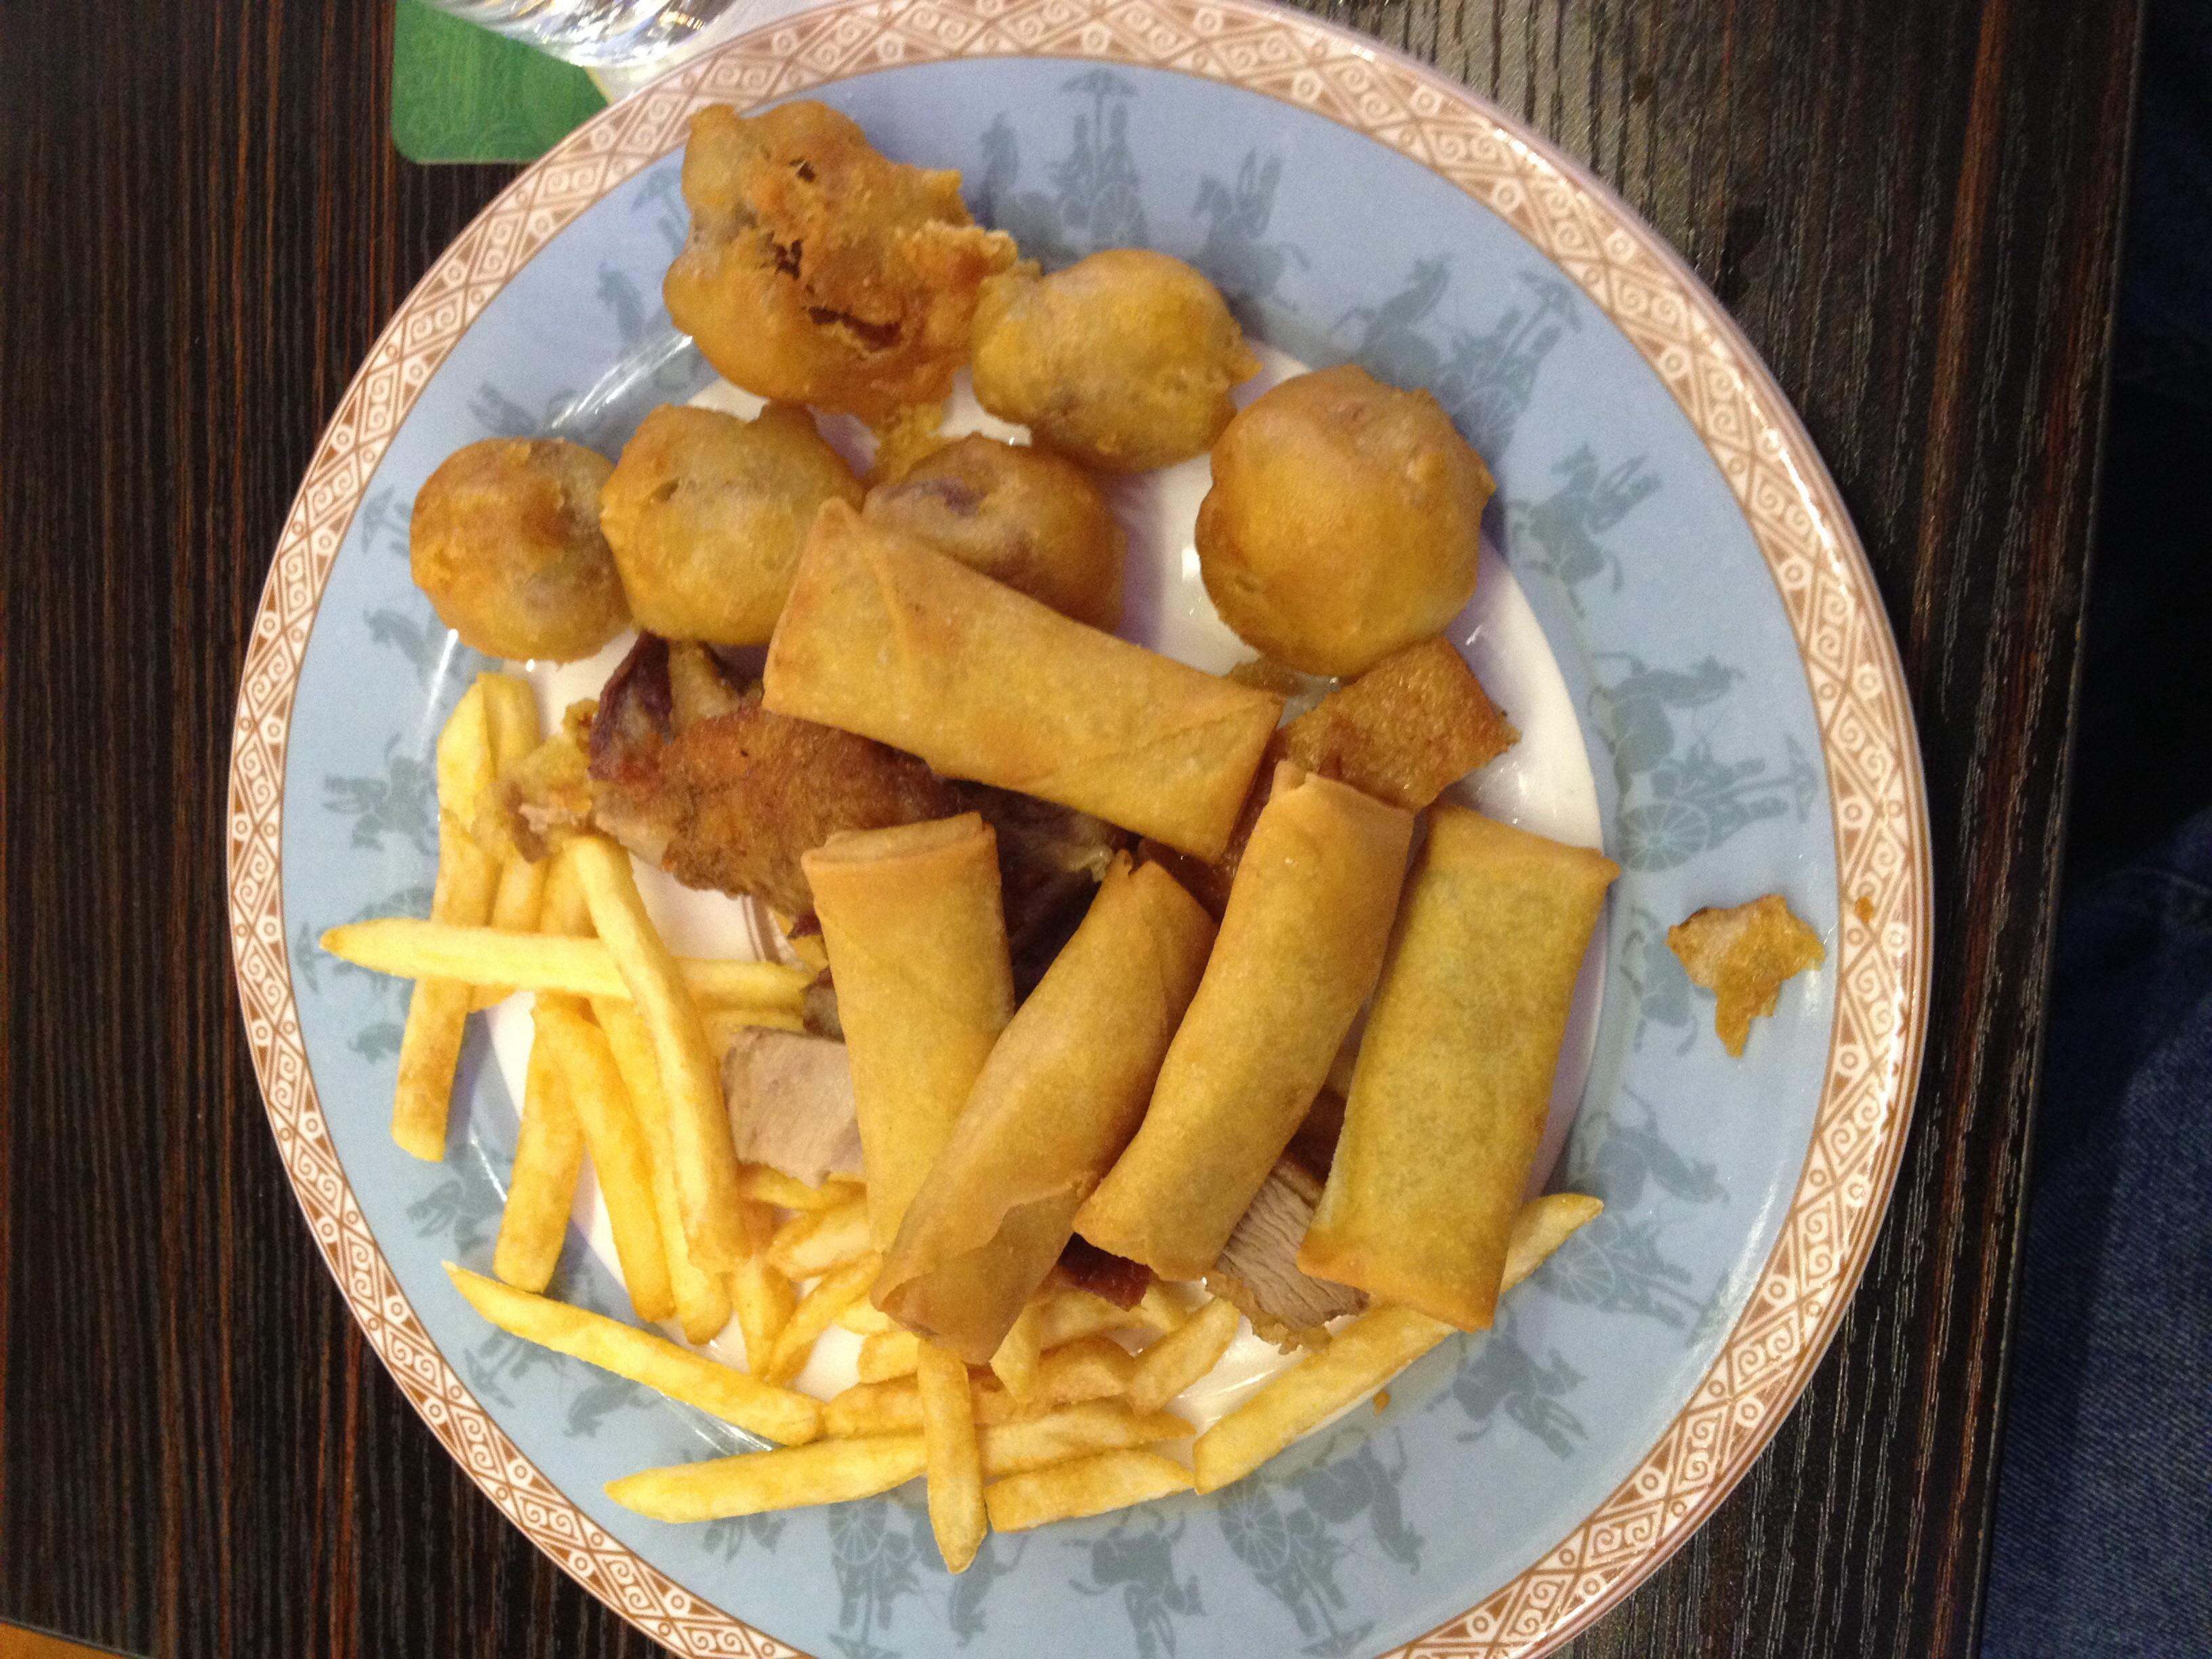 https://foodloader.net/BrollyLSSJ_2015-03-07_Yangtze_-_Buffet_-_Teller_2.jpg